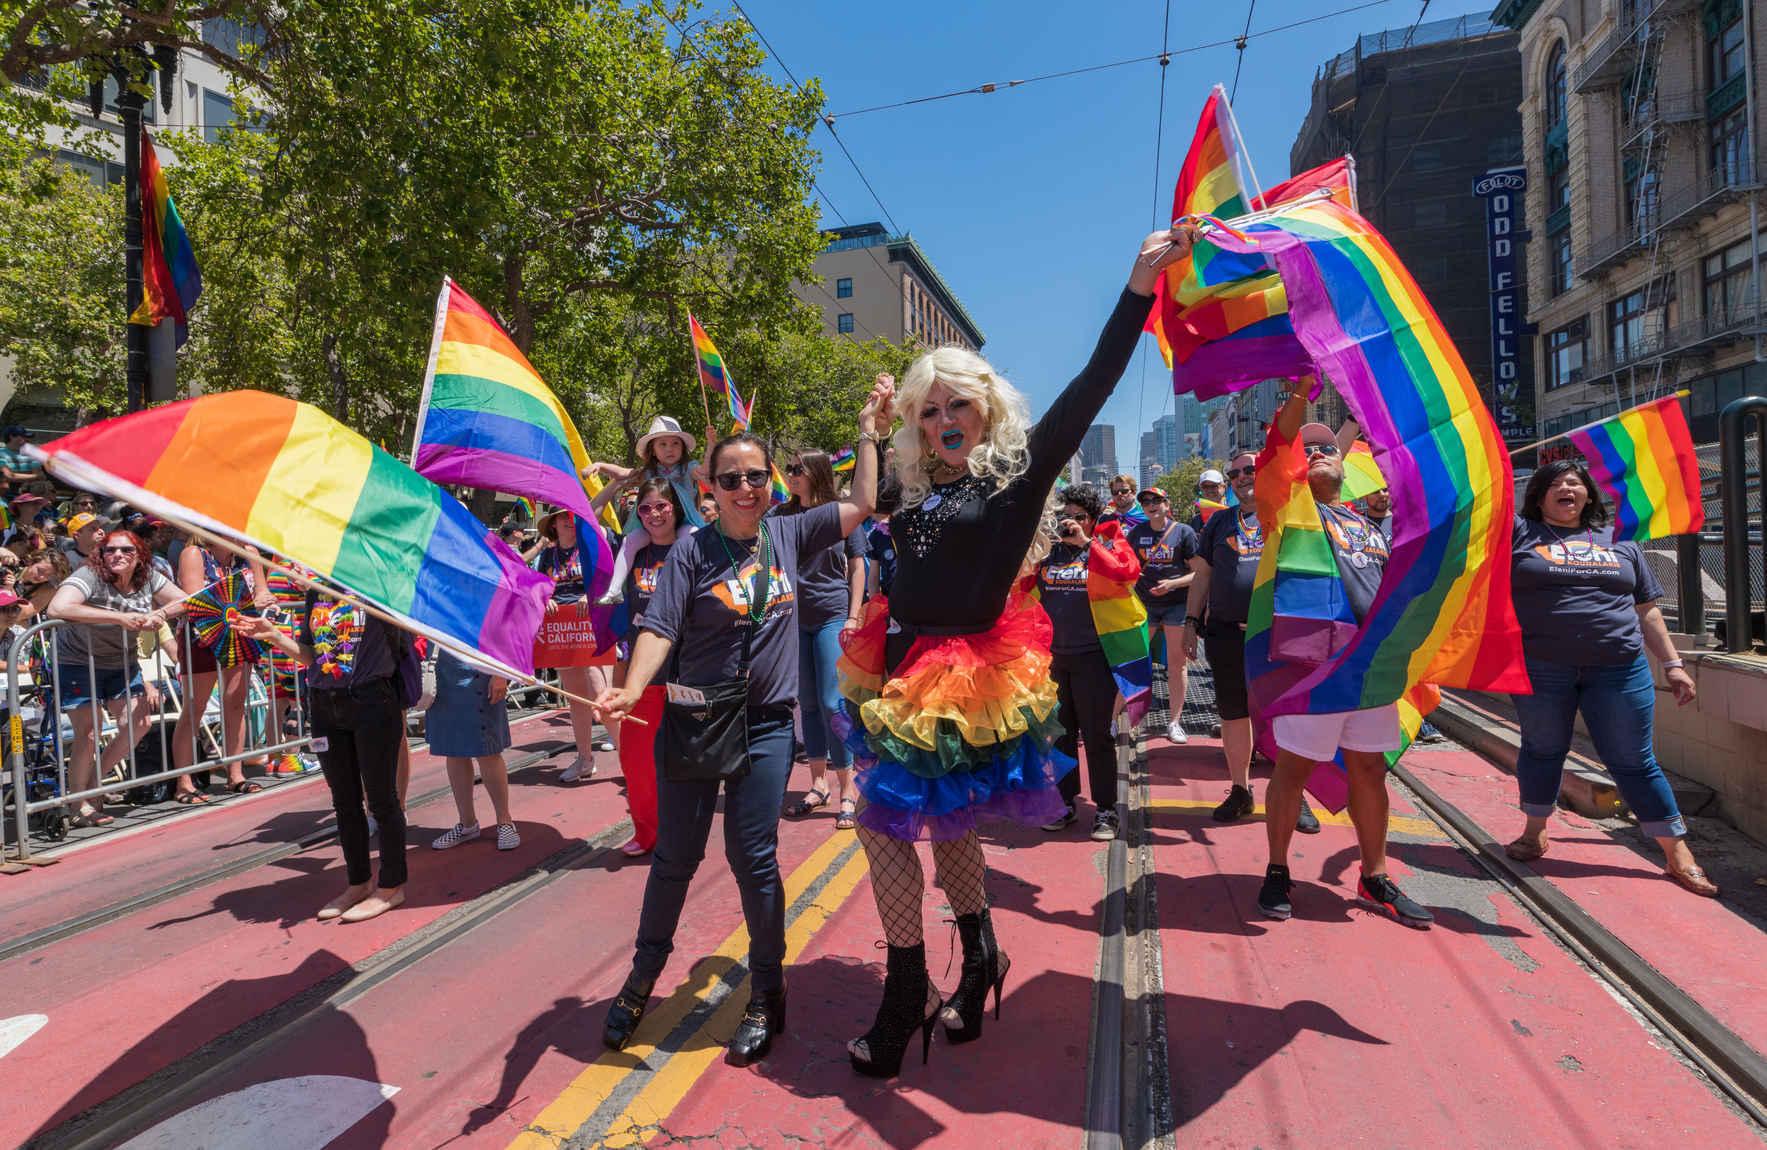 Support San Francisco LGBT Pride Parade & Celebration today! image